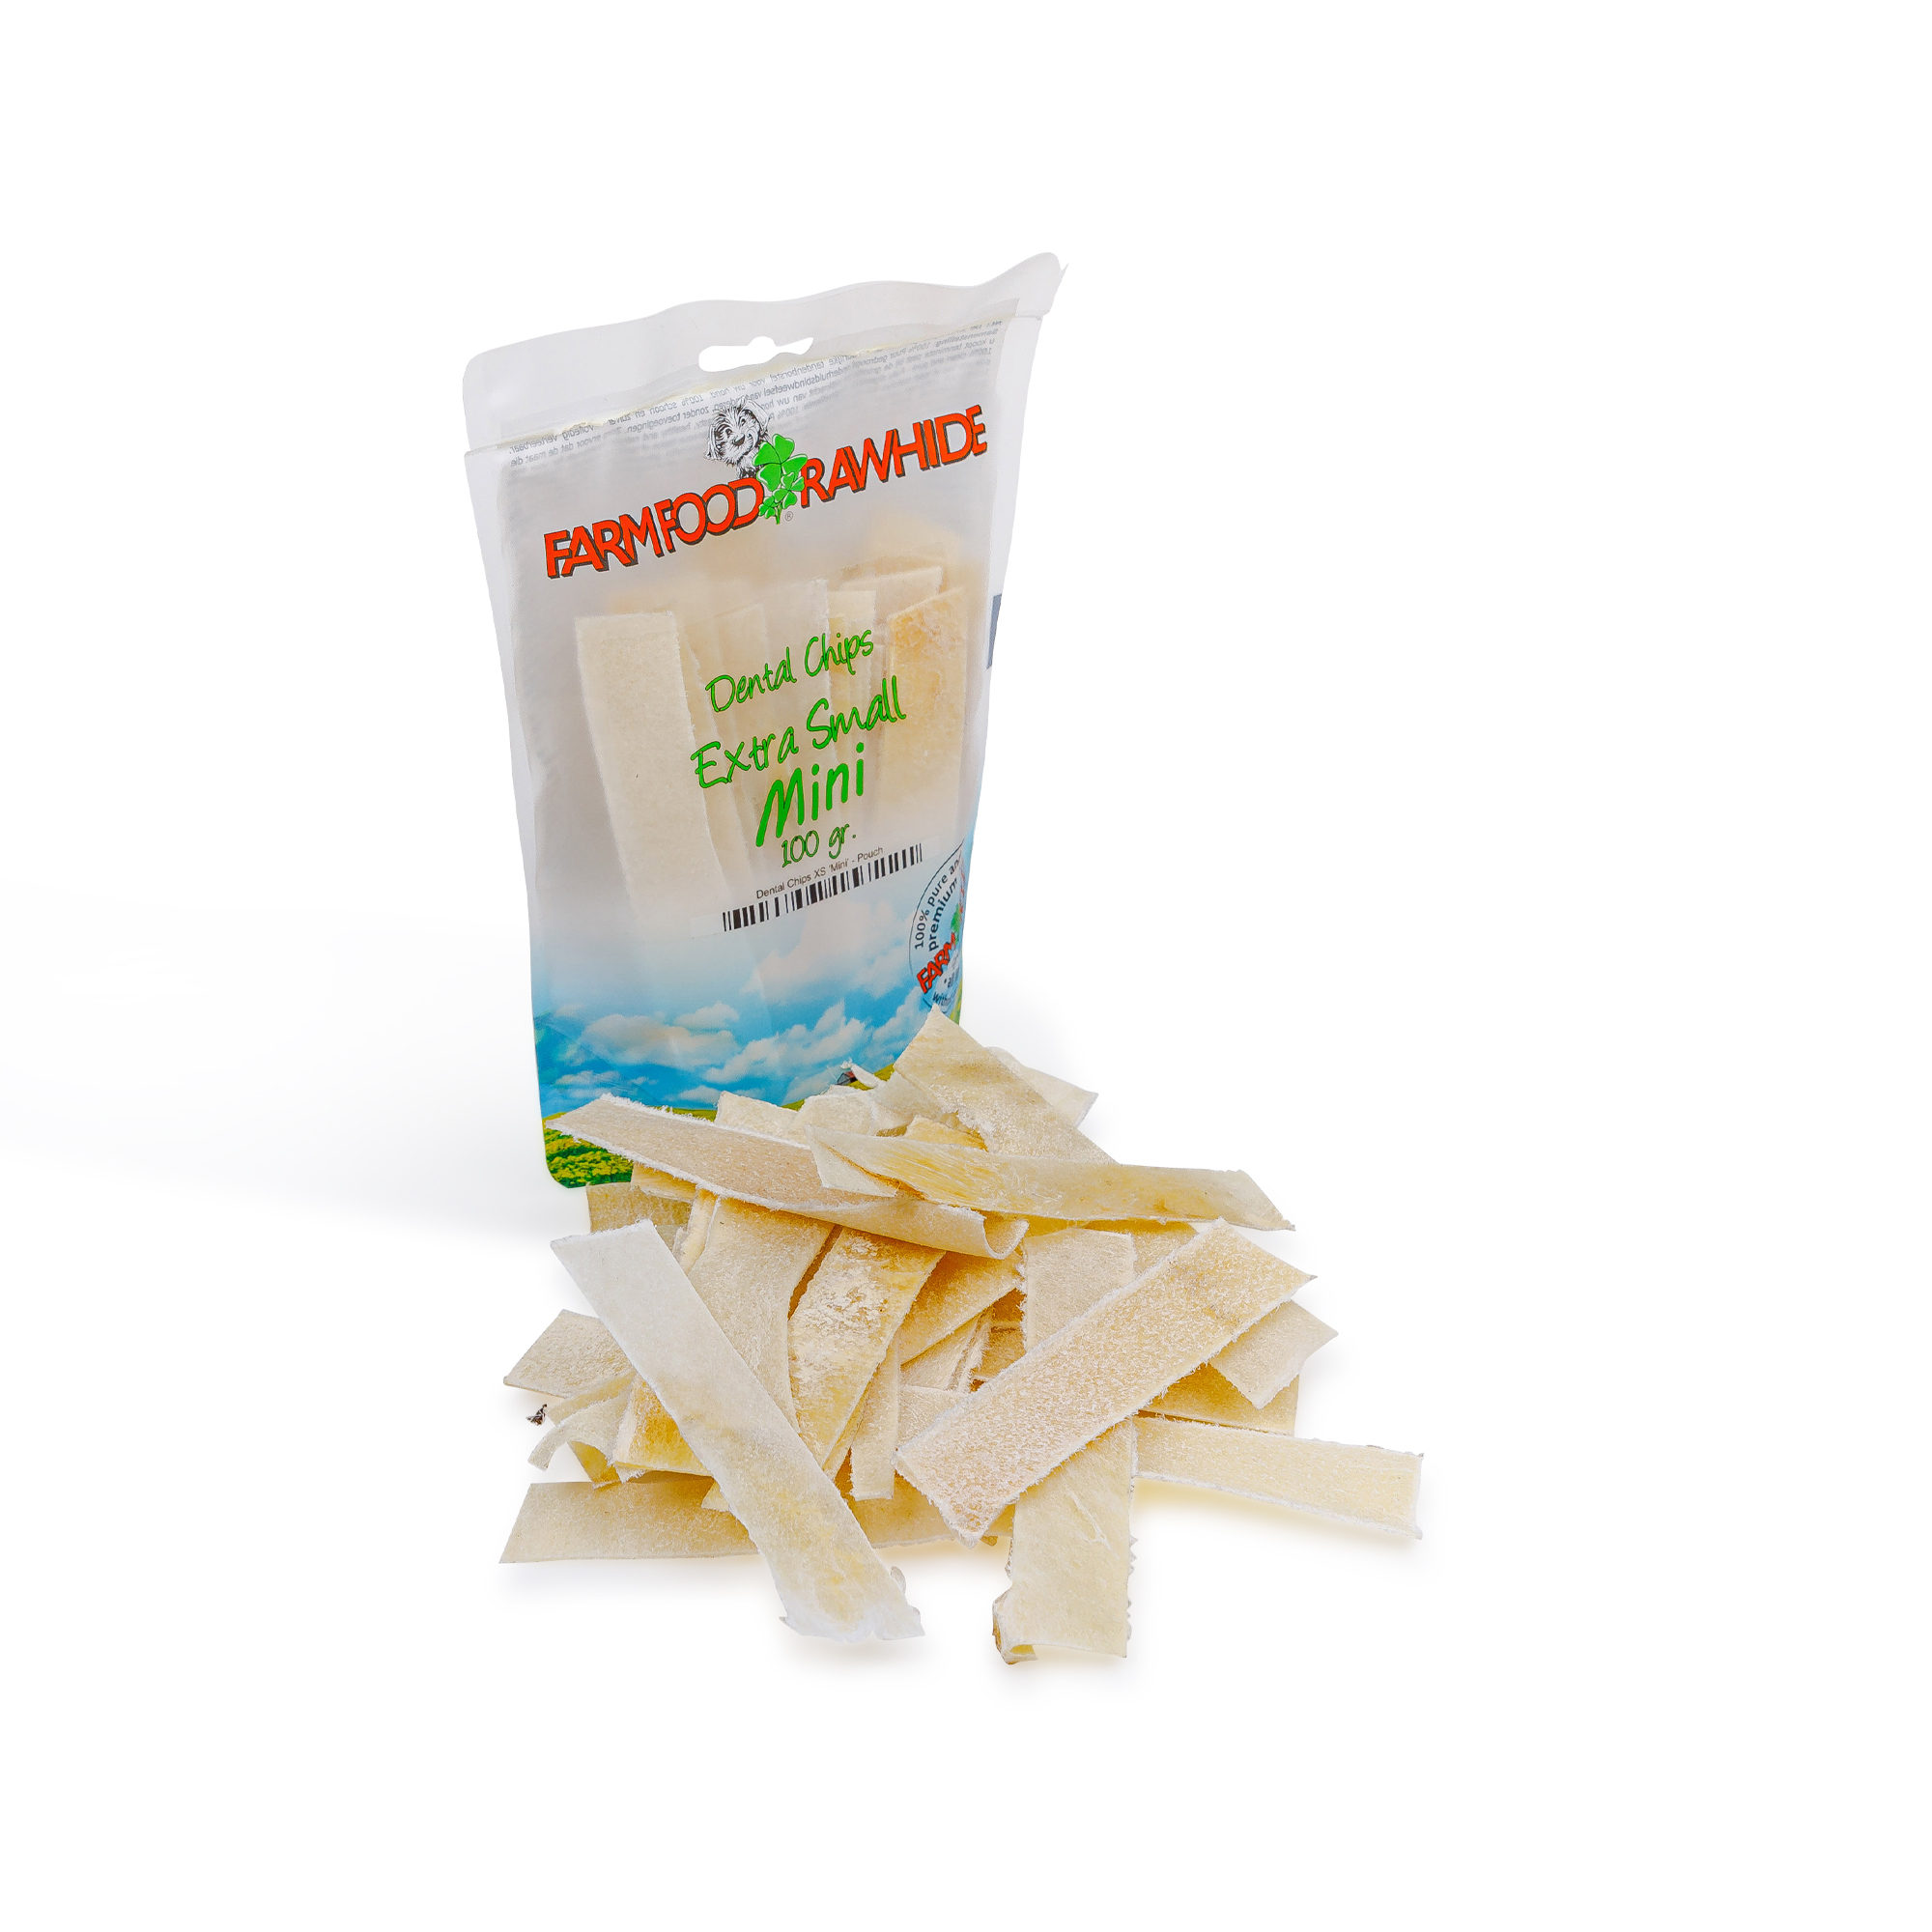 Farm Food Rawhide Dental Chips Mini